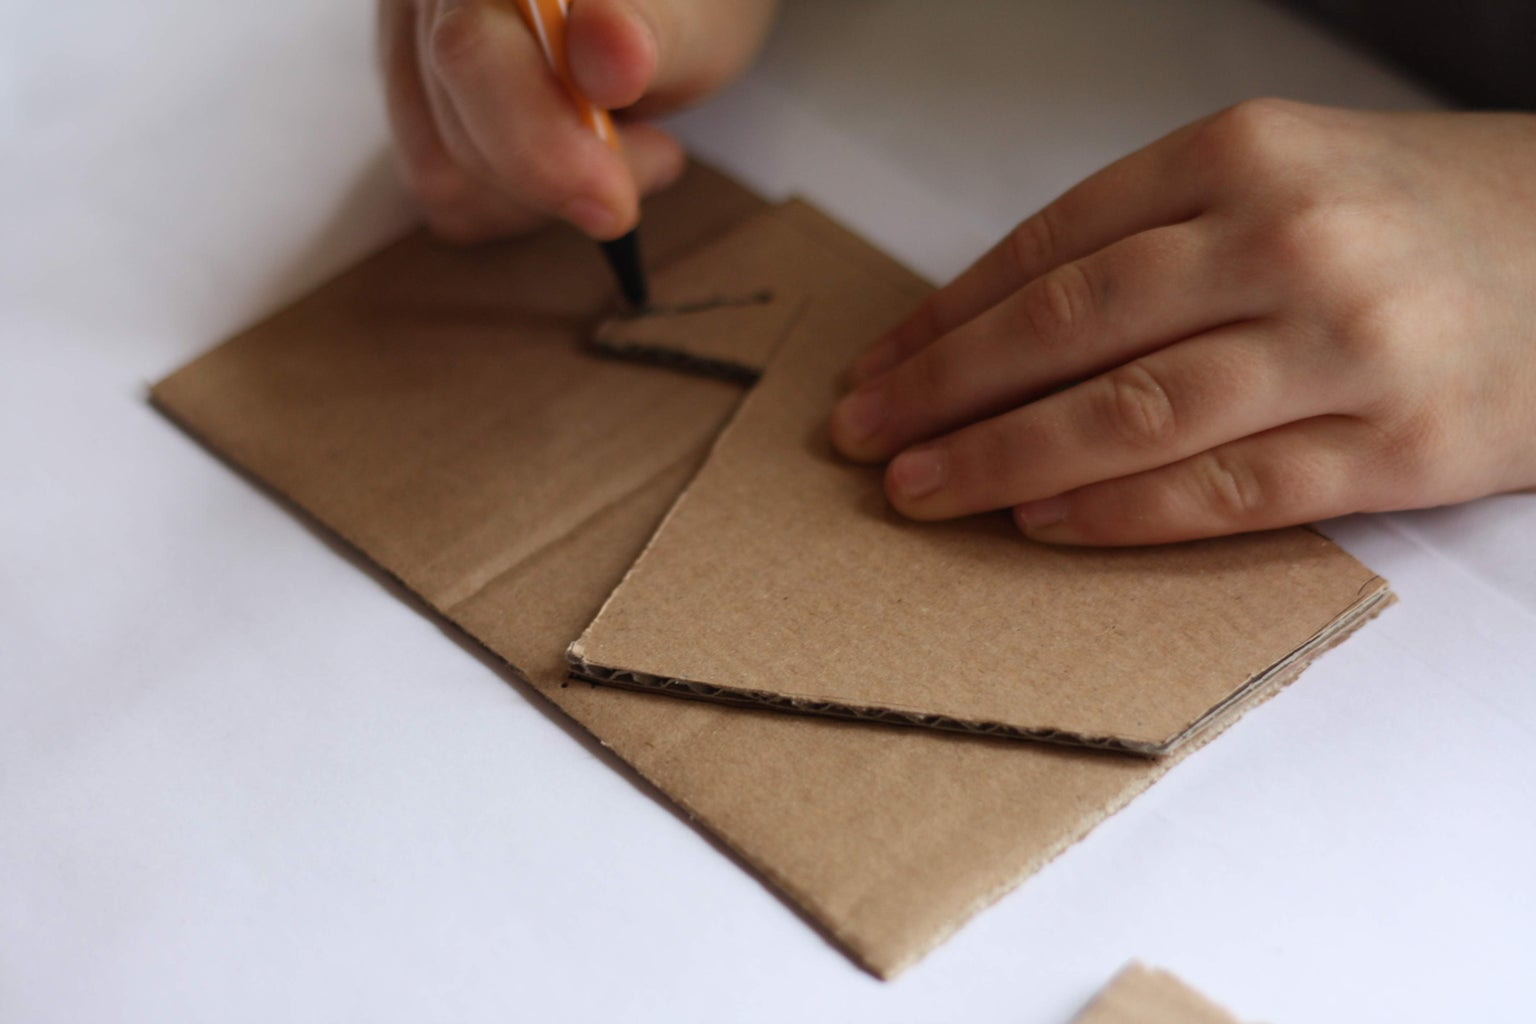 Step2: Cut Cardboard Stand